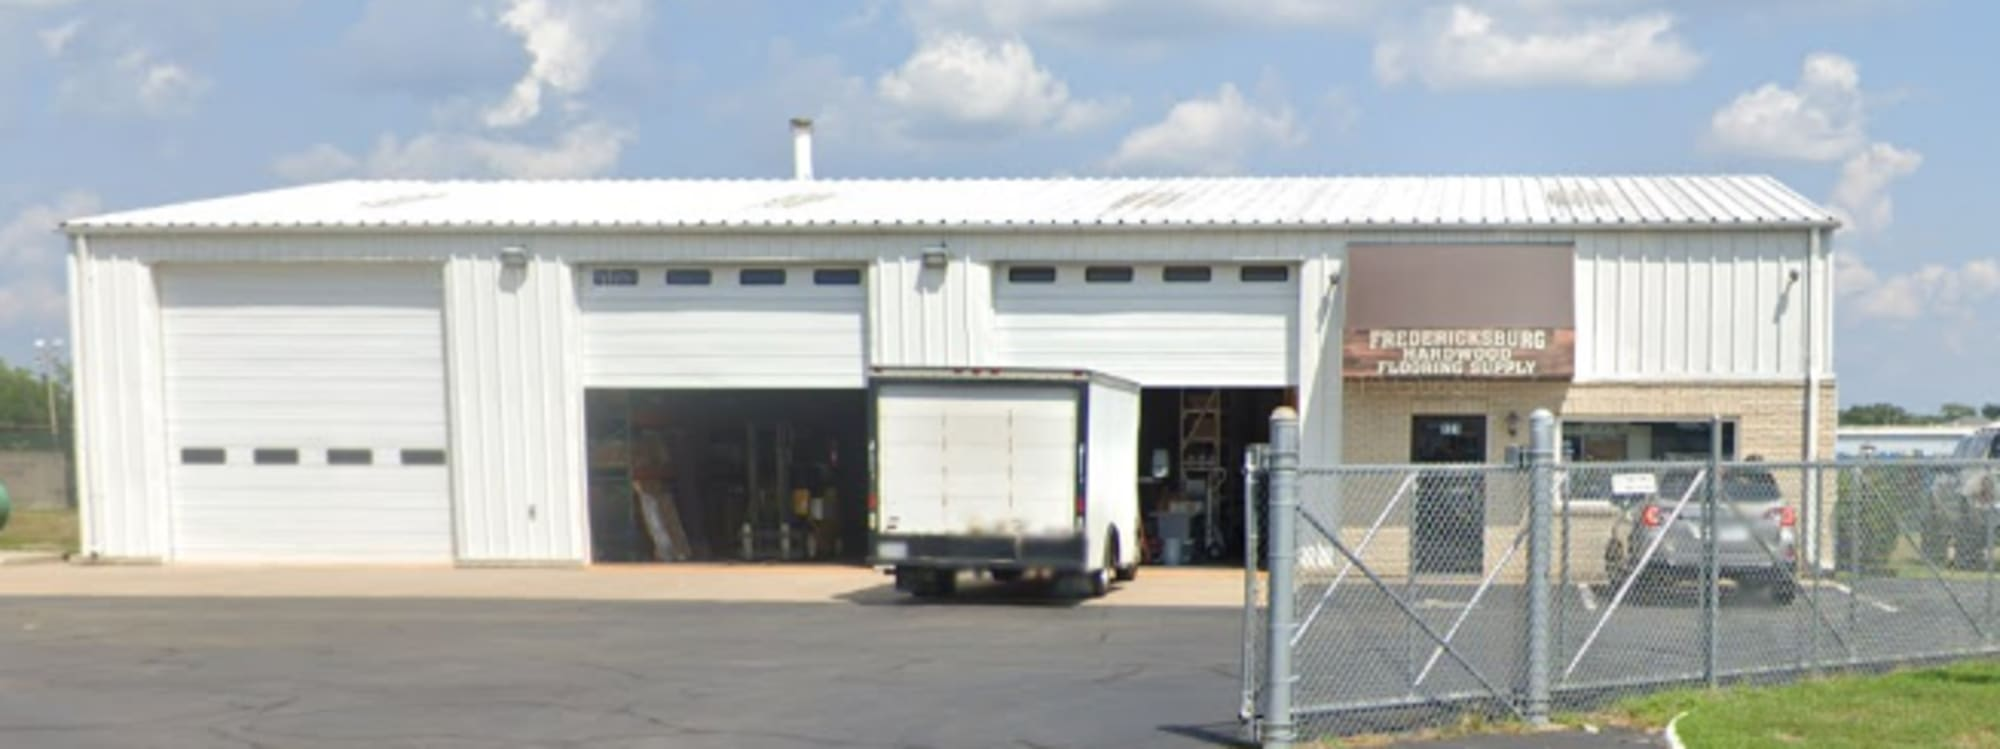 Fredericksburg Hardwood Flooring Supply - 121 Industrial Dr Fredericksburg, VA 22408